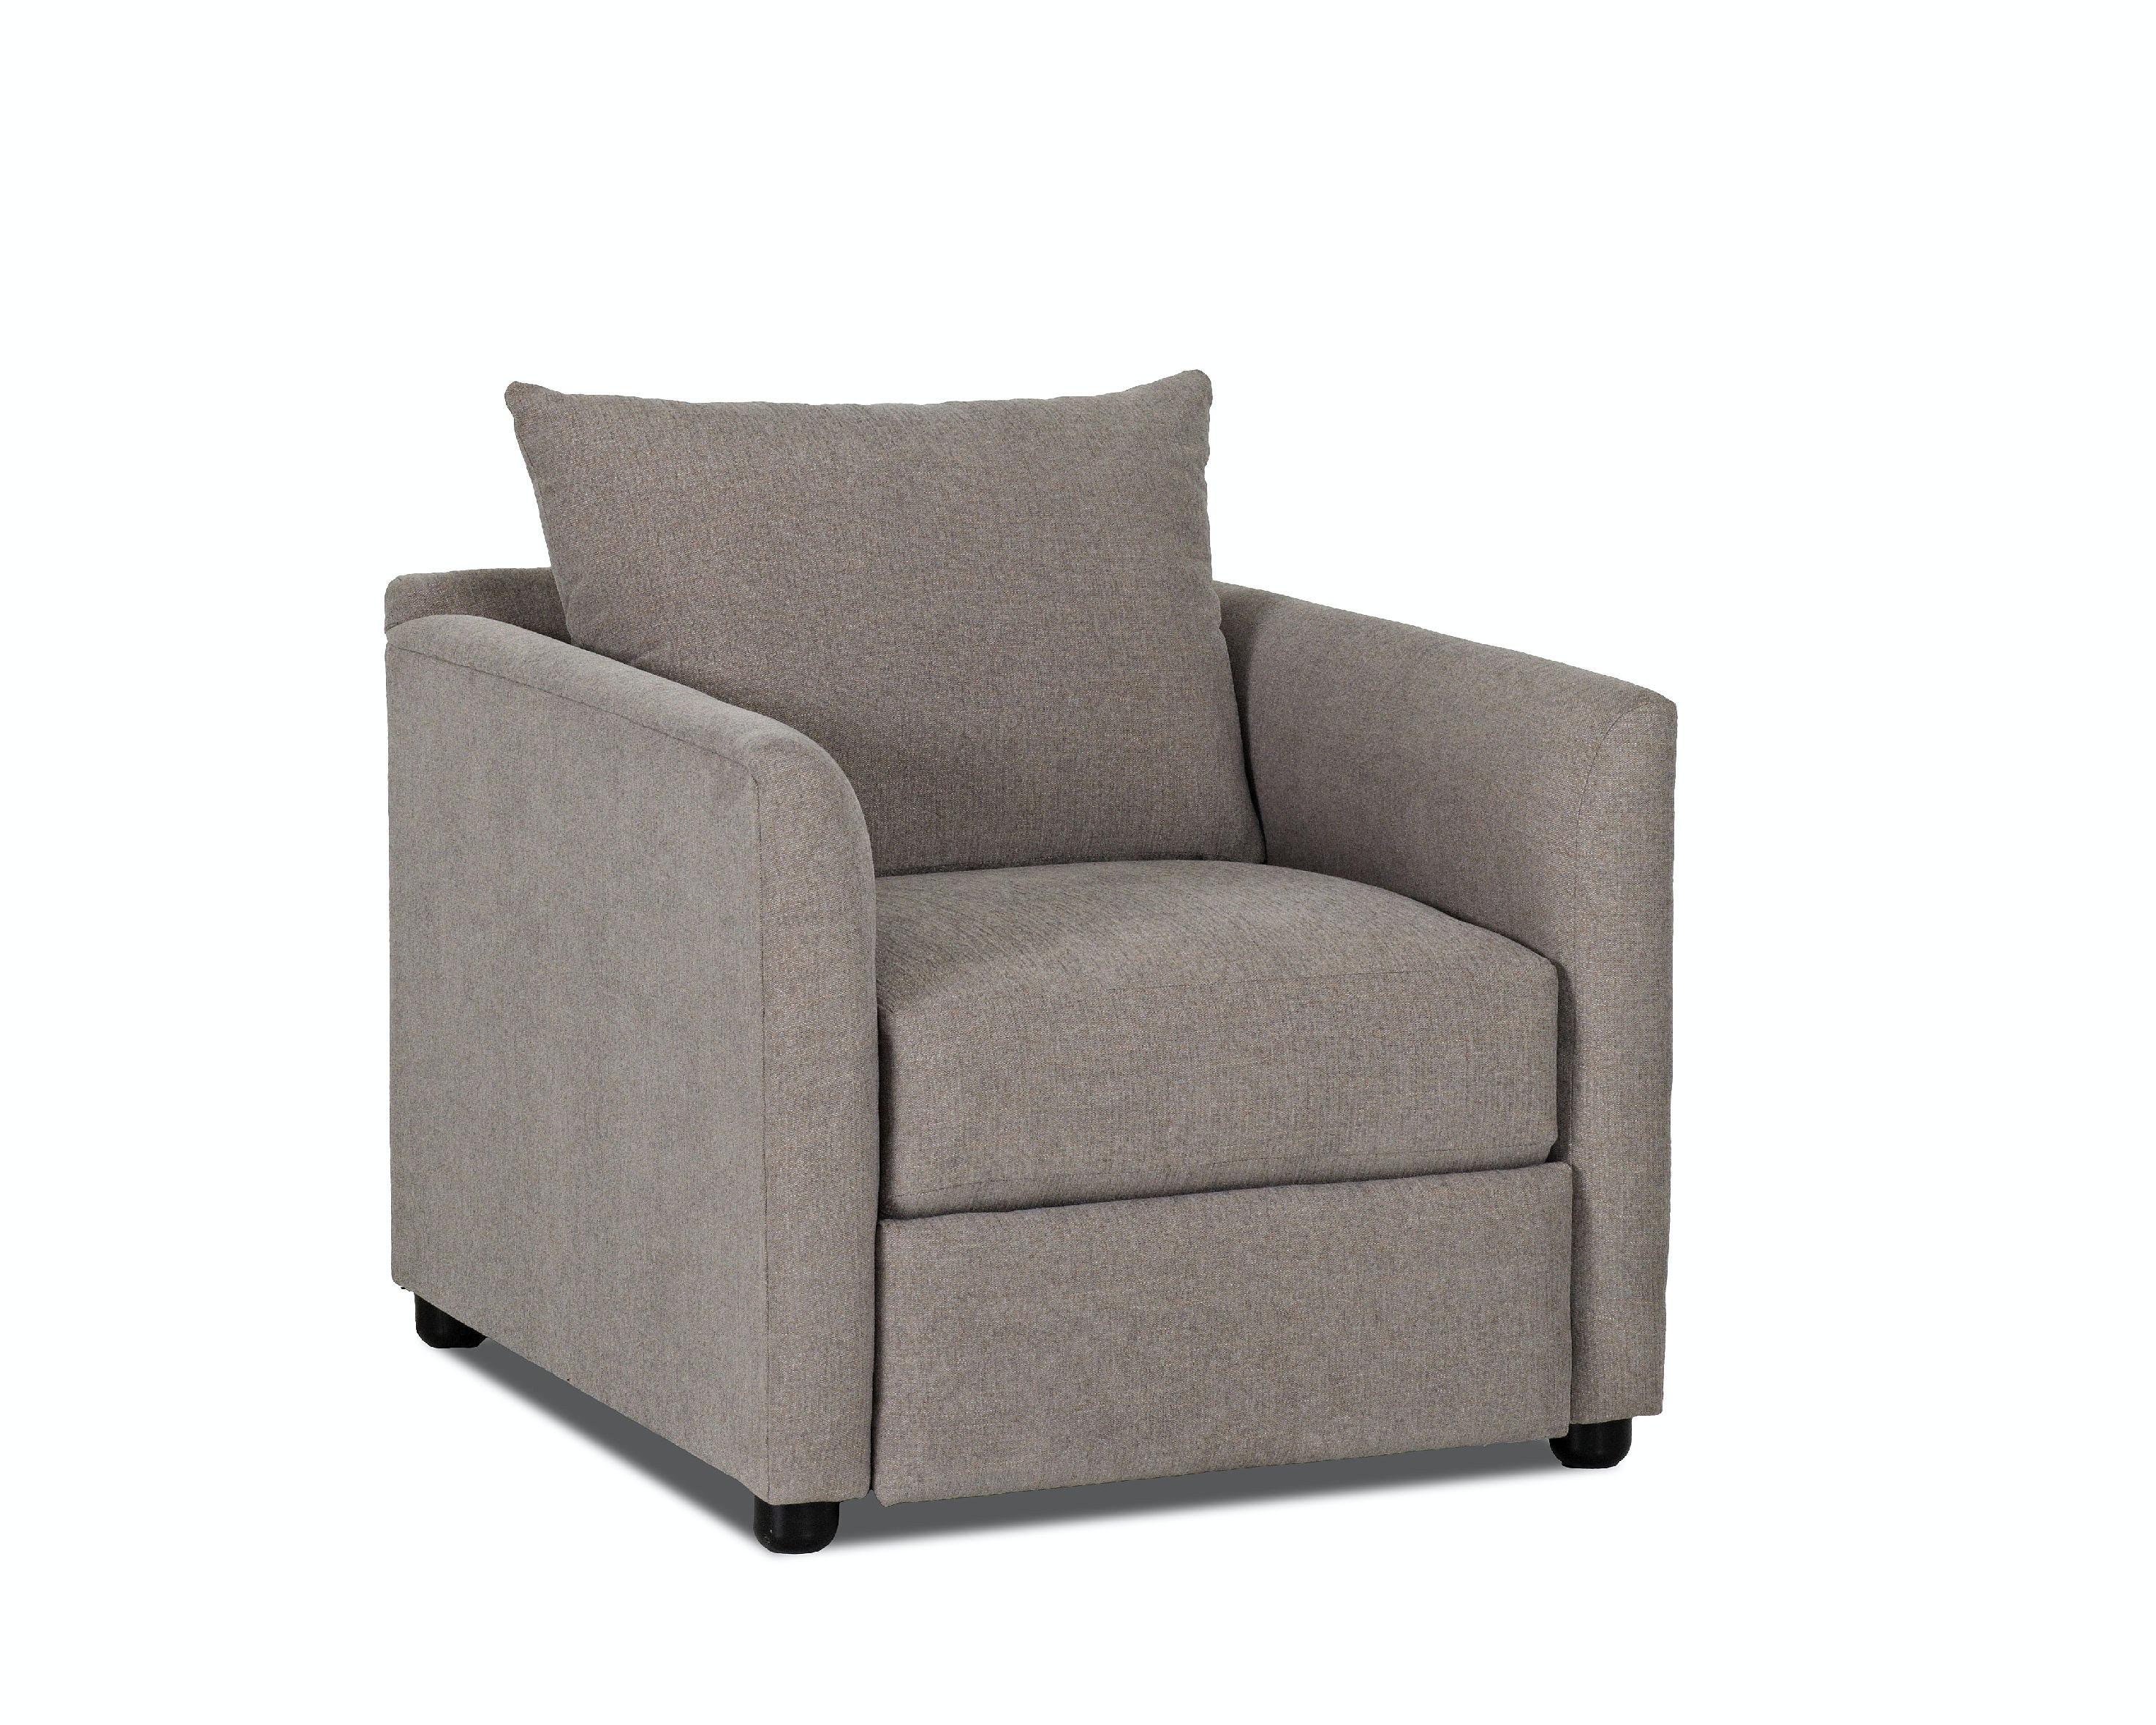 atlanta recliner chair strap patio chairs trisha yearwood living room 27803 pwrc b f